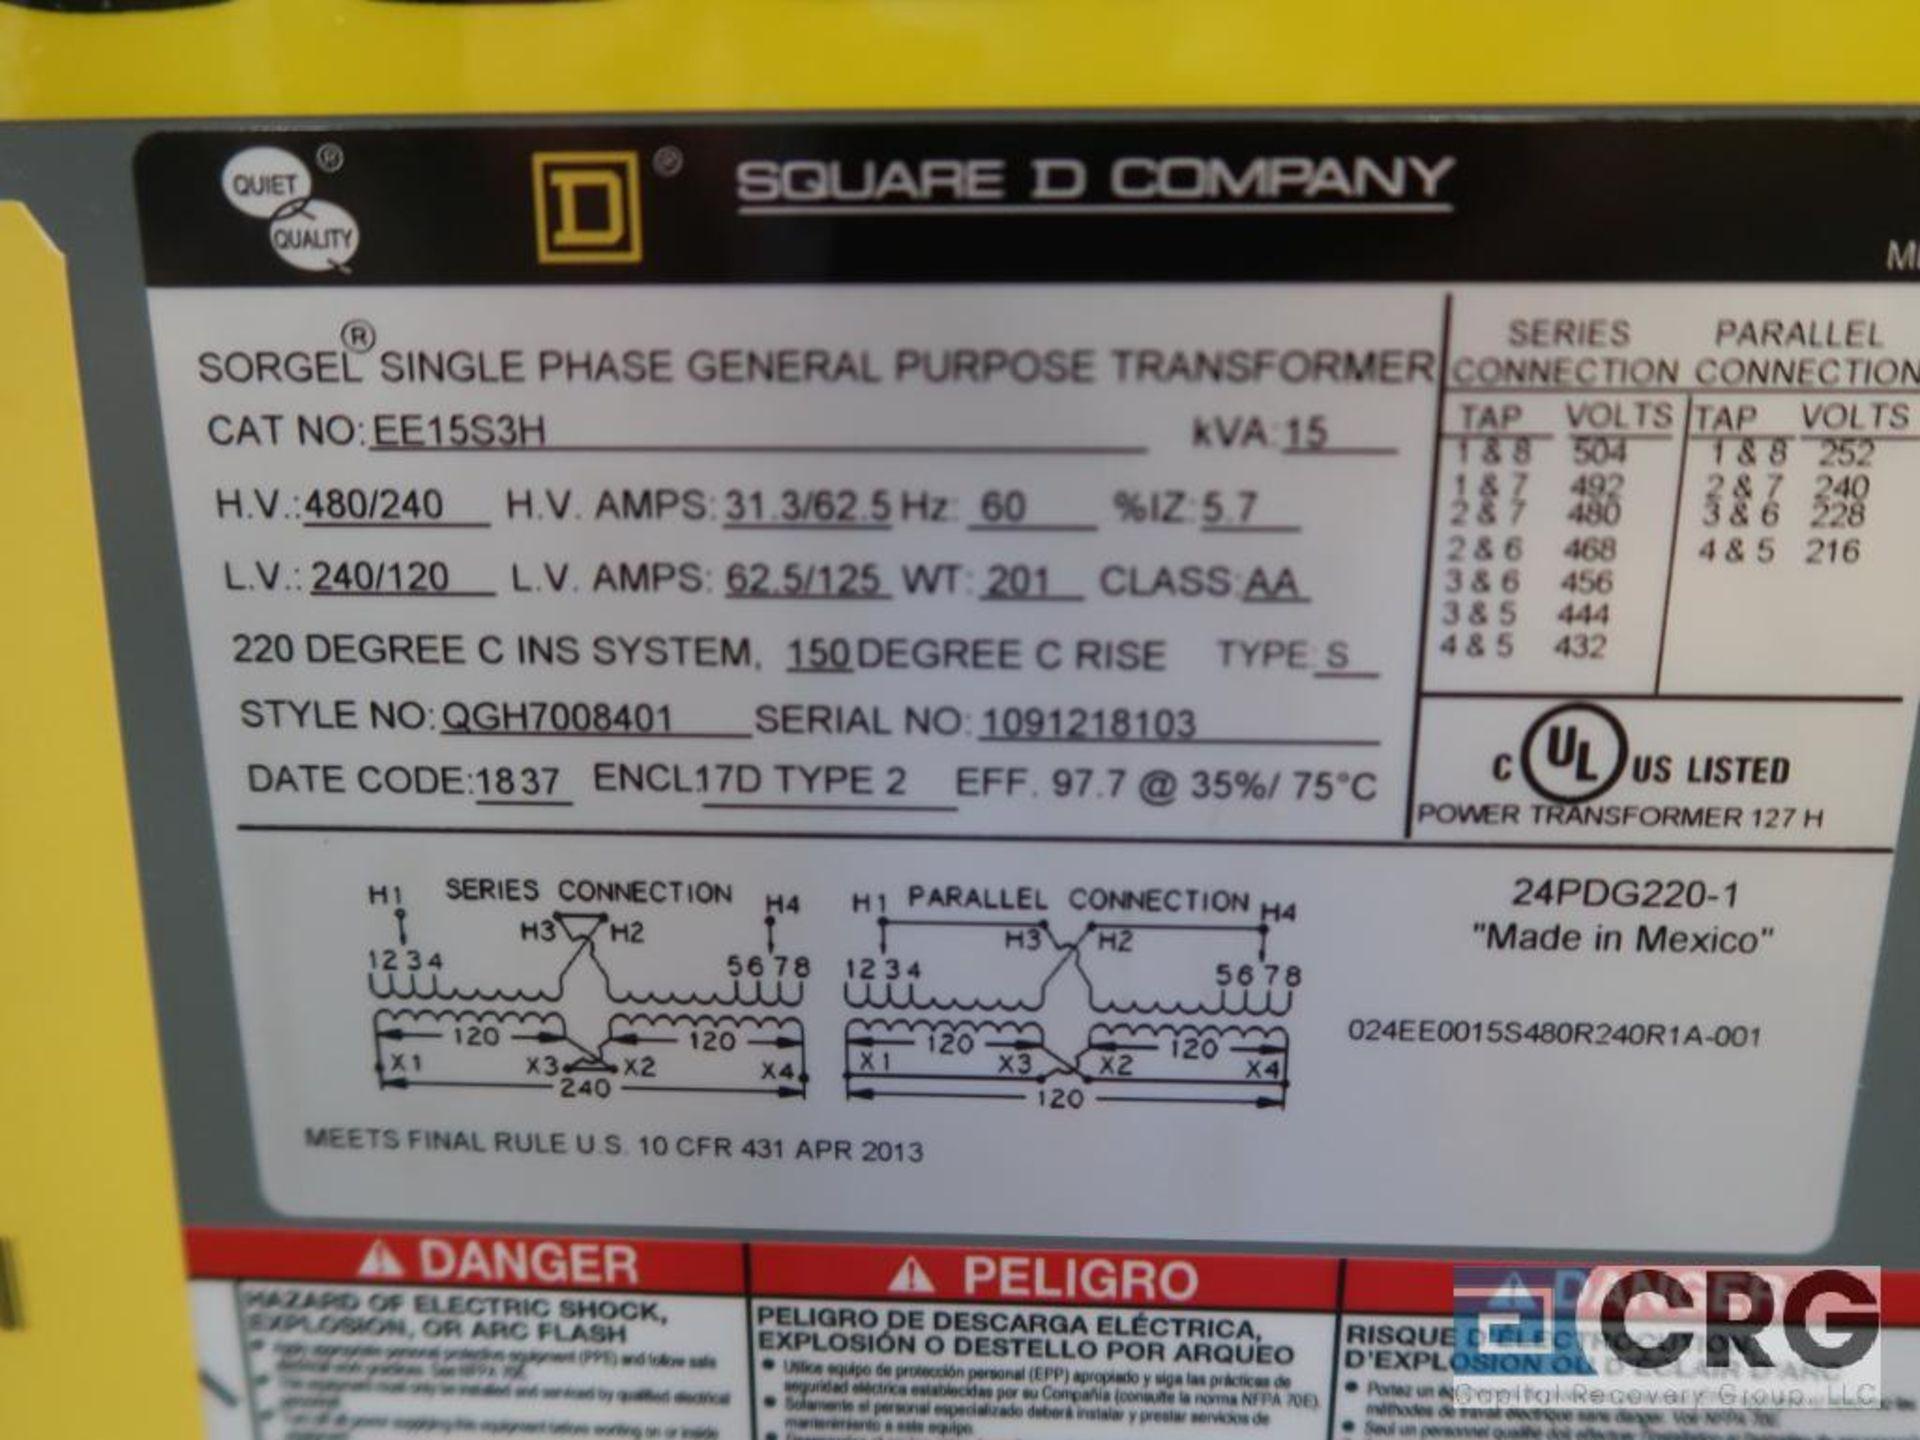 Square D single phase transformer, 15 KVA, 240/480 volt, s/n 18103 (Finish Building) - Image 2 of 2